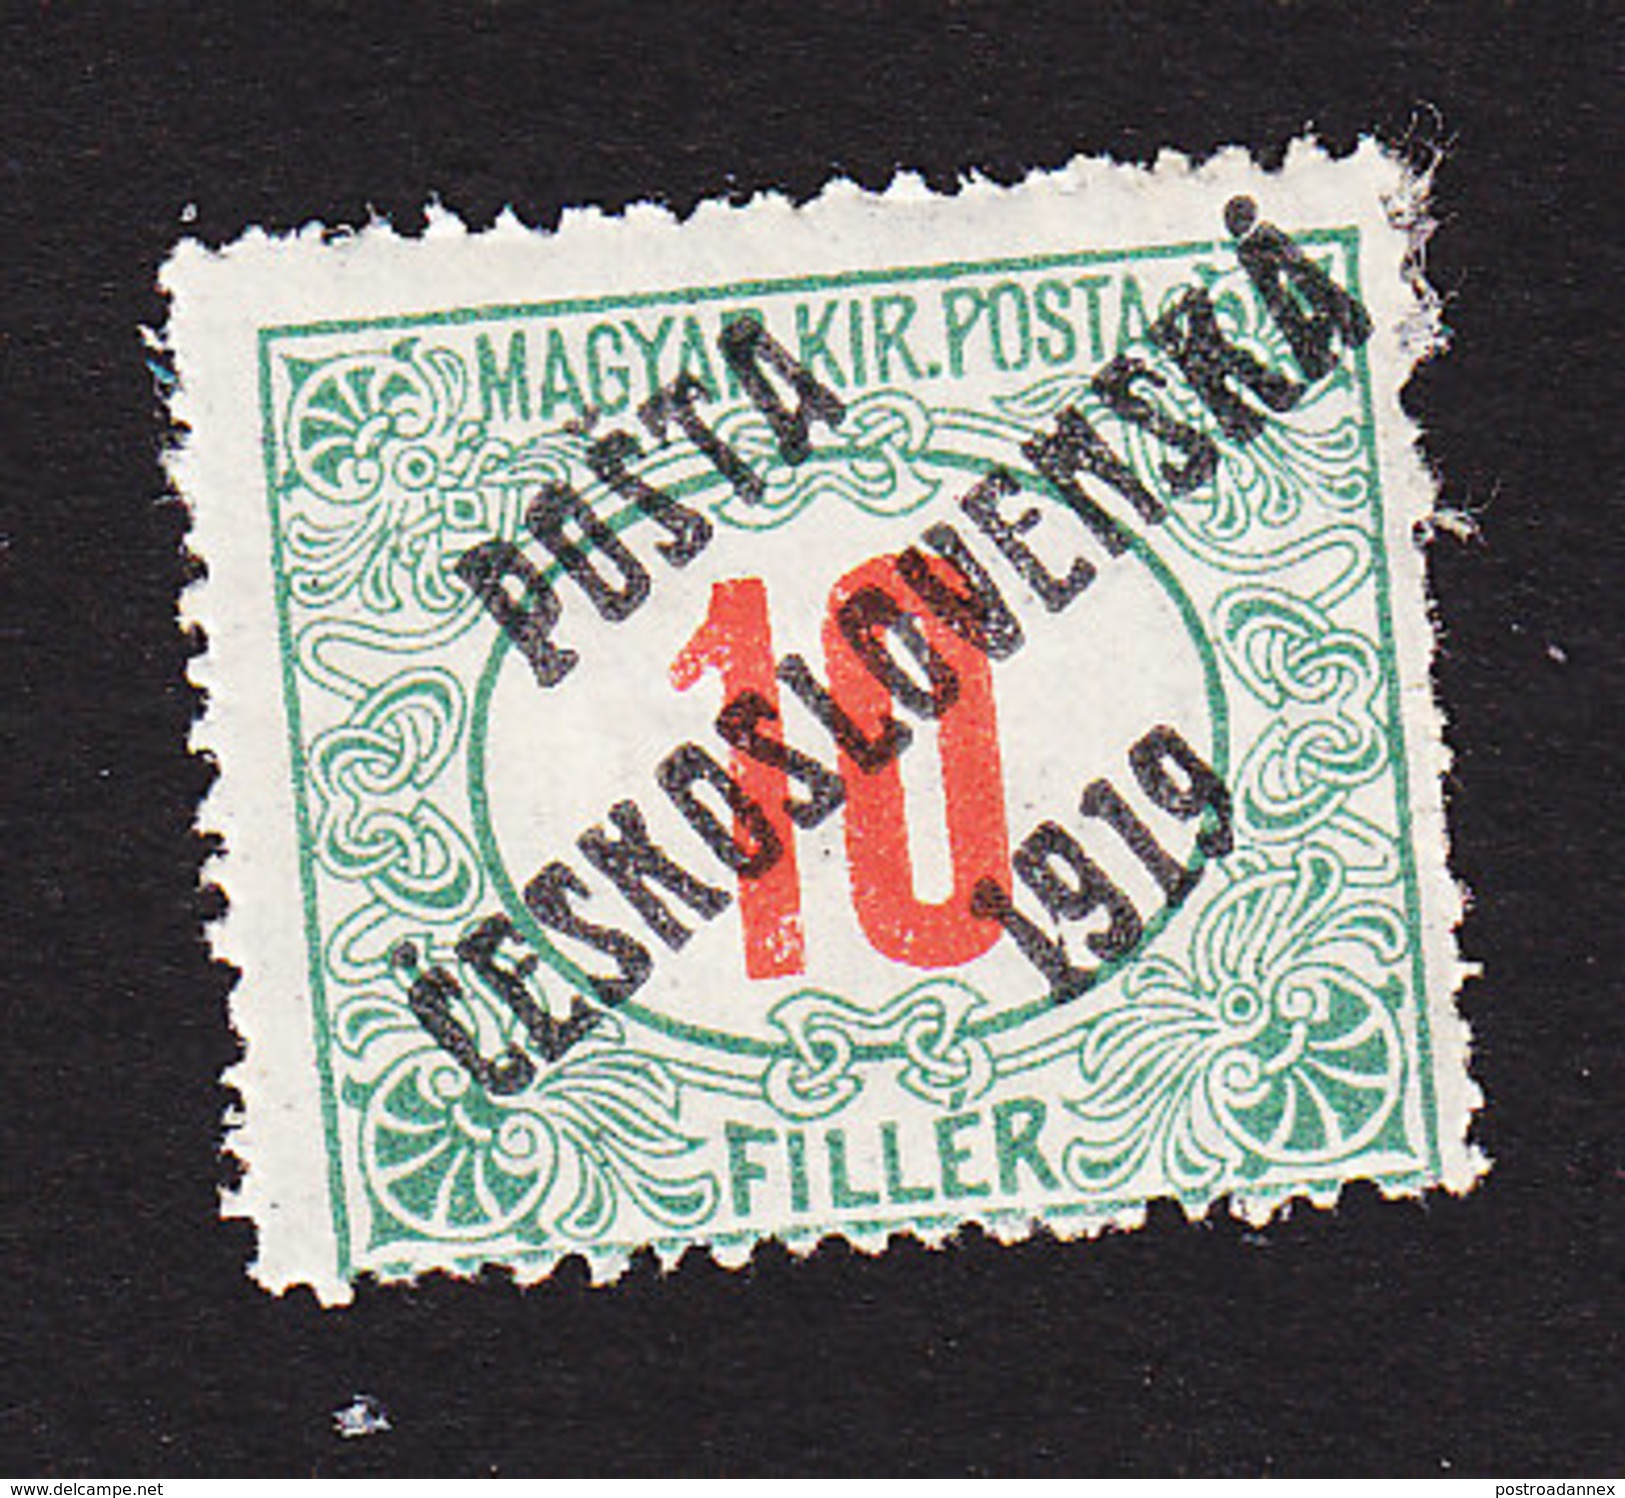 Czechoslovakia, Scott #B119, Mint Hinged, Hungarian Stamps Overprinted, Issued 1919 - Czechoslovakia